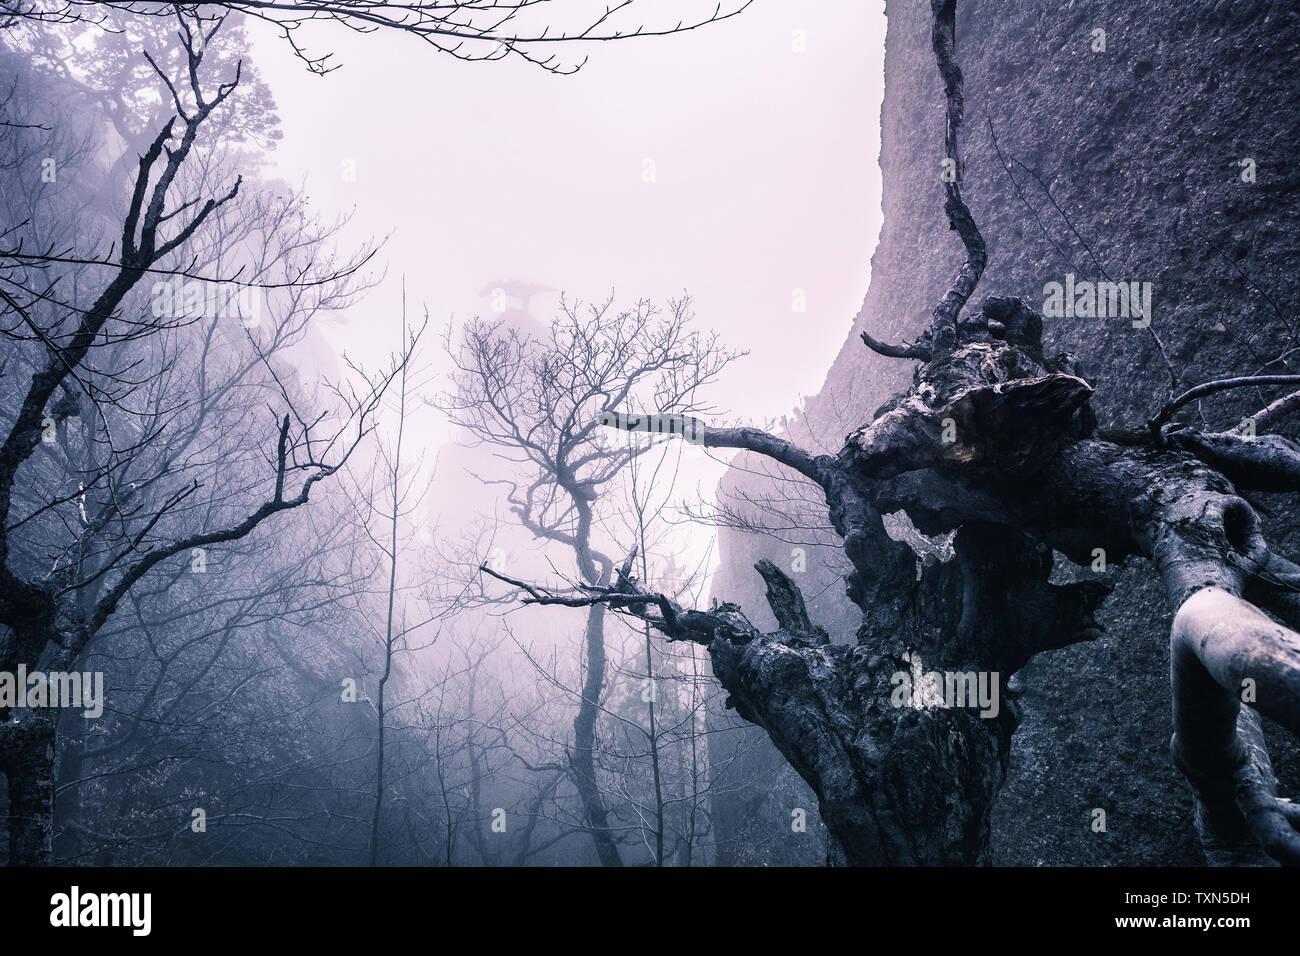 Misty forest in the Demerdzhi mountain range in the Valley of ghosts Crimea Мистический вид на дерево и скалы в тумане в Долине привидений на Демерджи - Stock Image